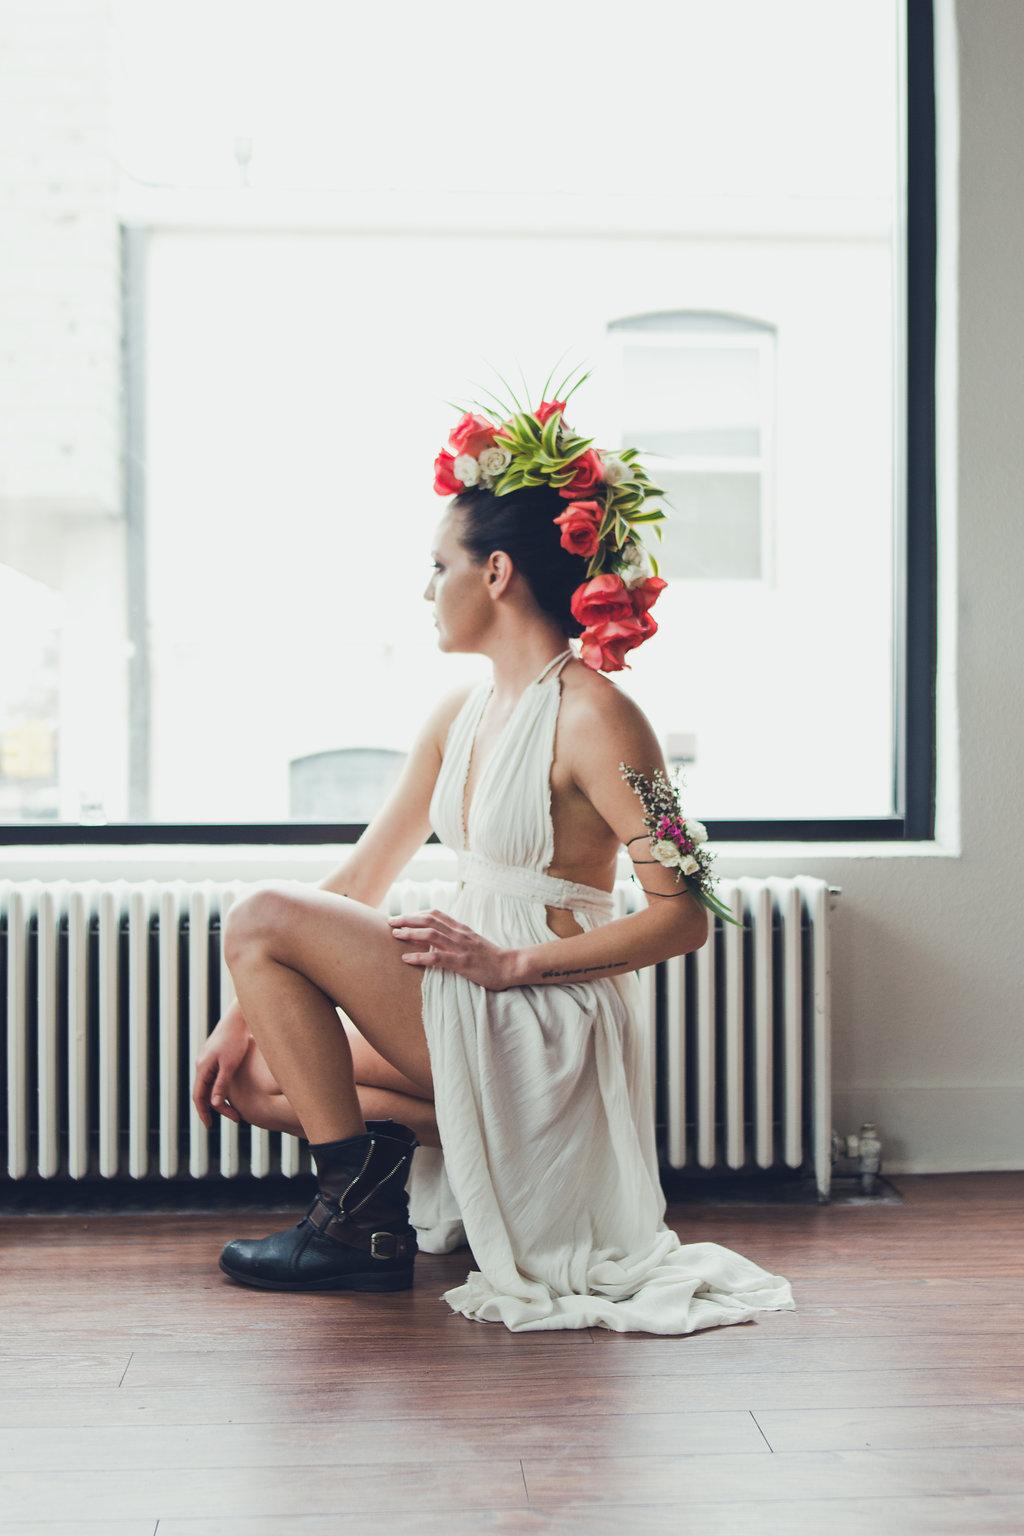 Lisa Rundall Wedding Photography Colorado model kneeling by window